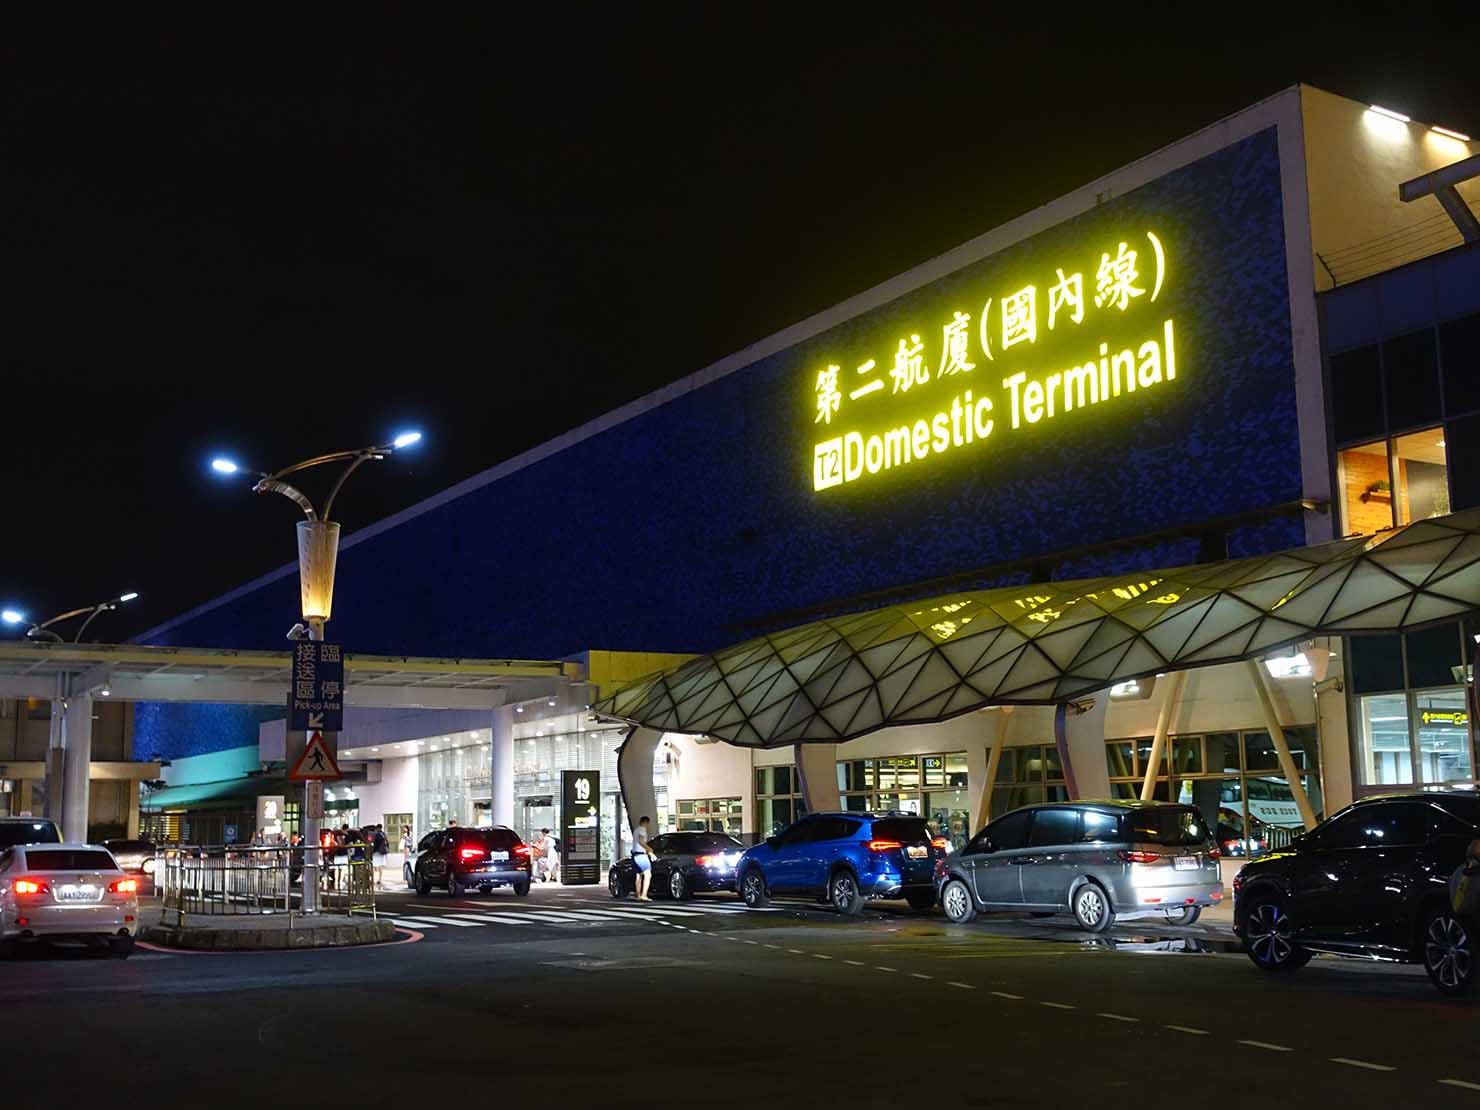 KKday外国人限定「花蓮・太魯閣(タロコ)日帰りツアー」台北・松山空港に到着